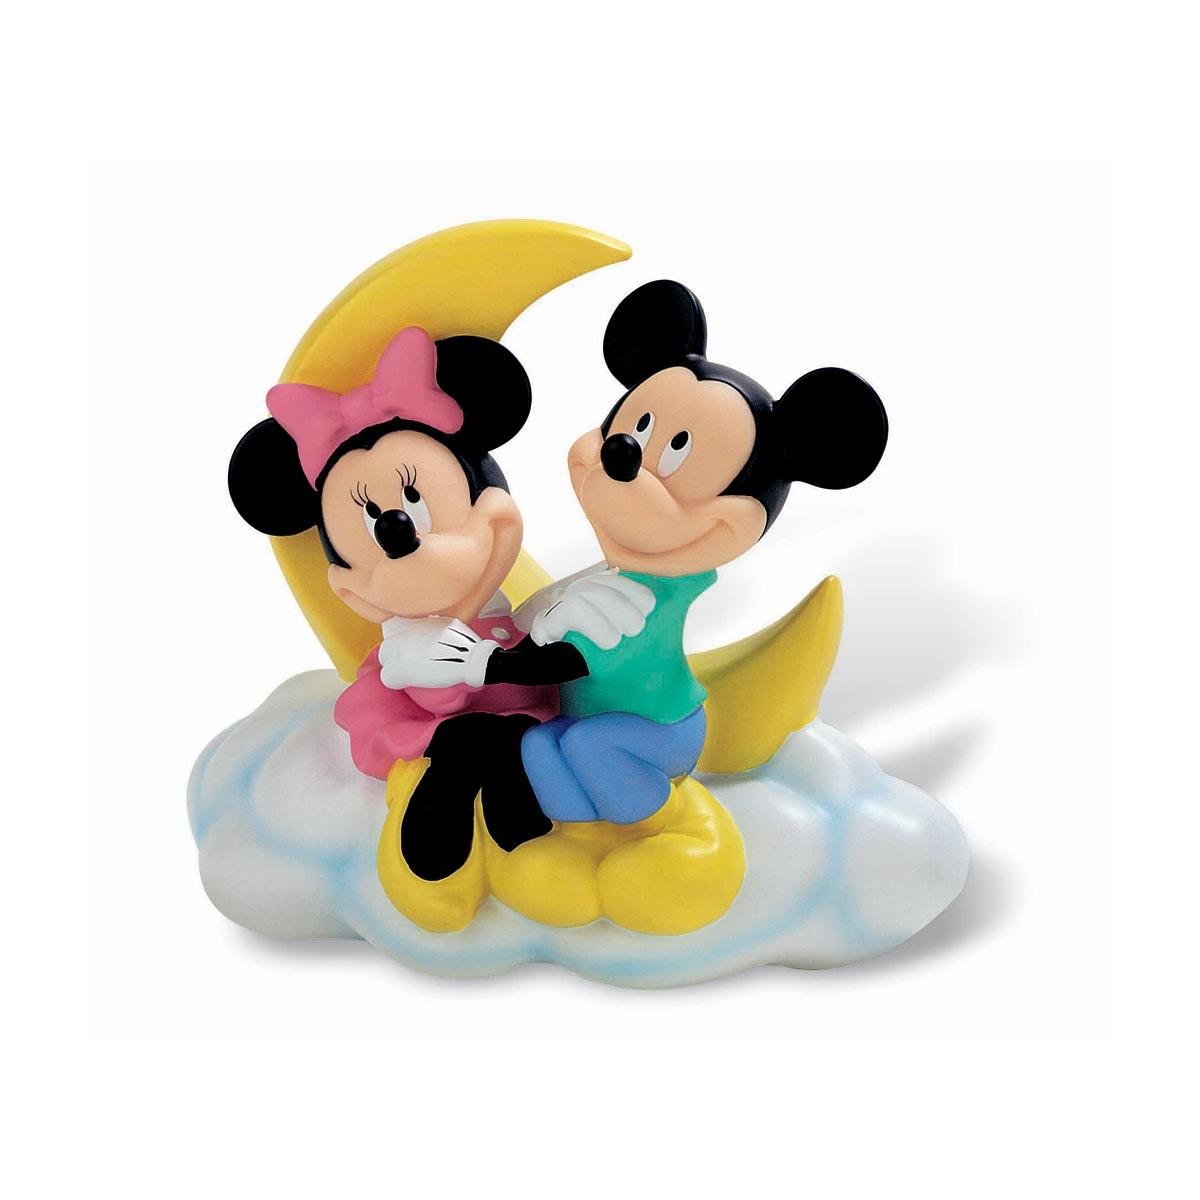 disney tirelire mickey minnie 18 cm figurine discount. Black Bedroom Furniture Sets. Home Design Ideas